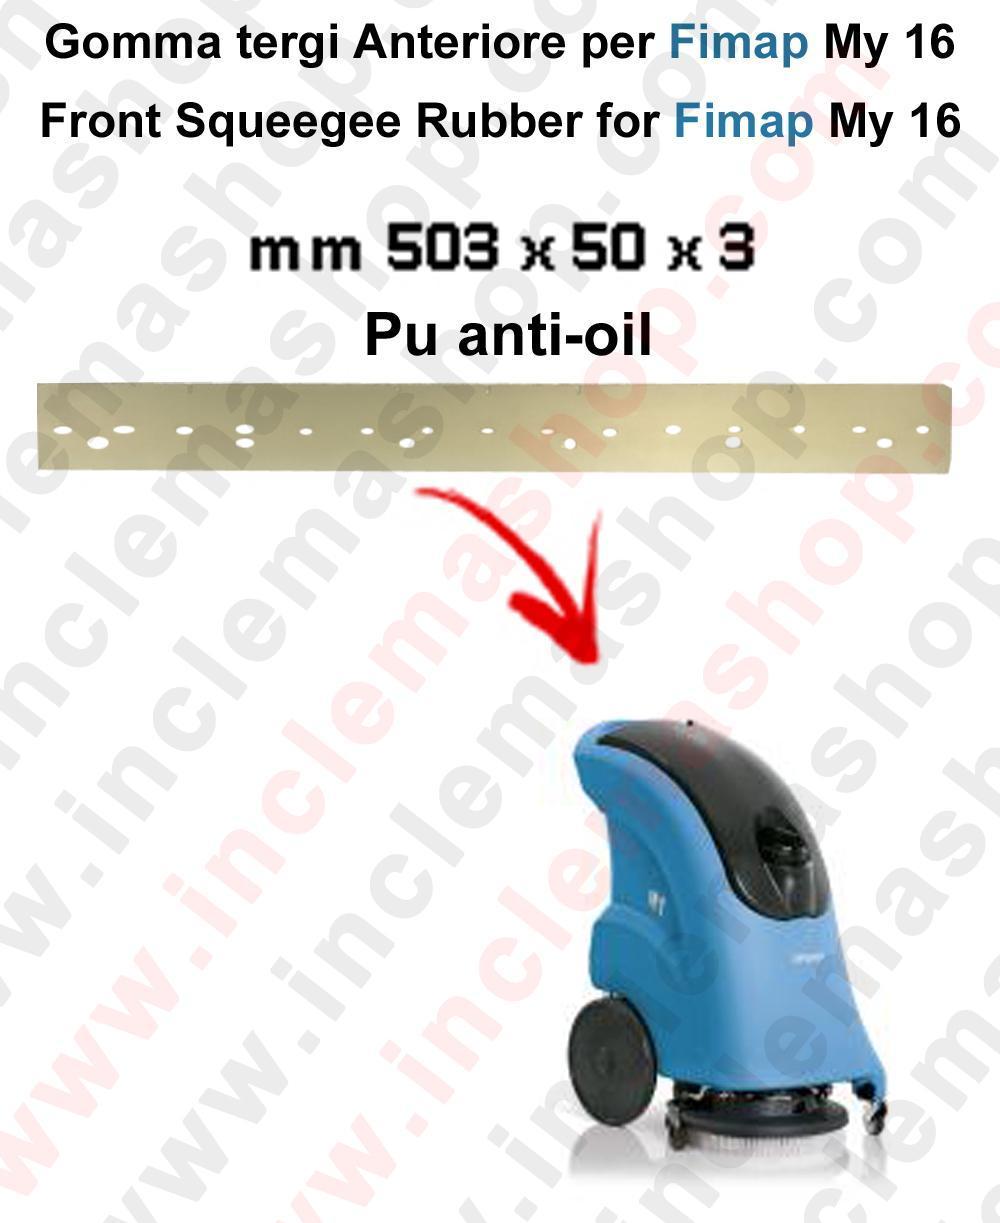 My 16 BAVETTE in Poliuretano Anti-huile AVANT pour autolaveuses et autolaveuses FIMAP